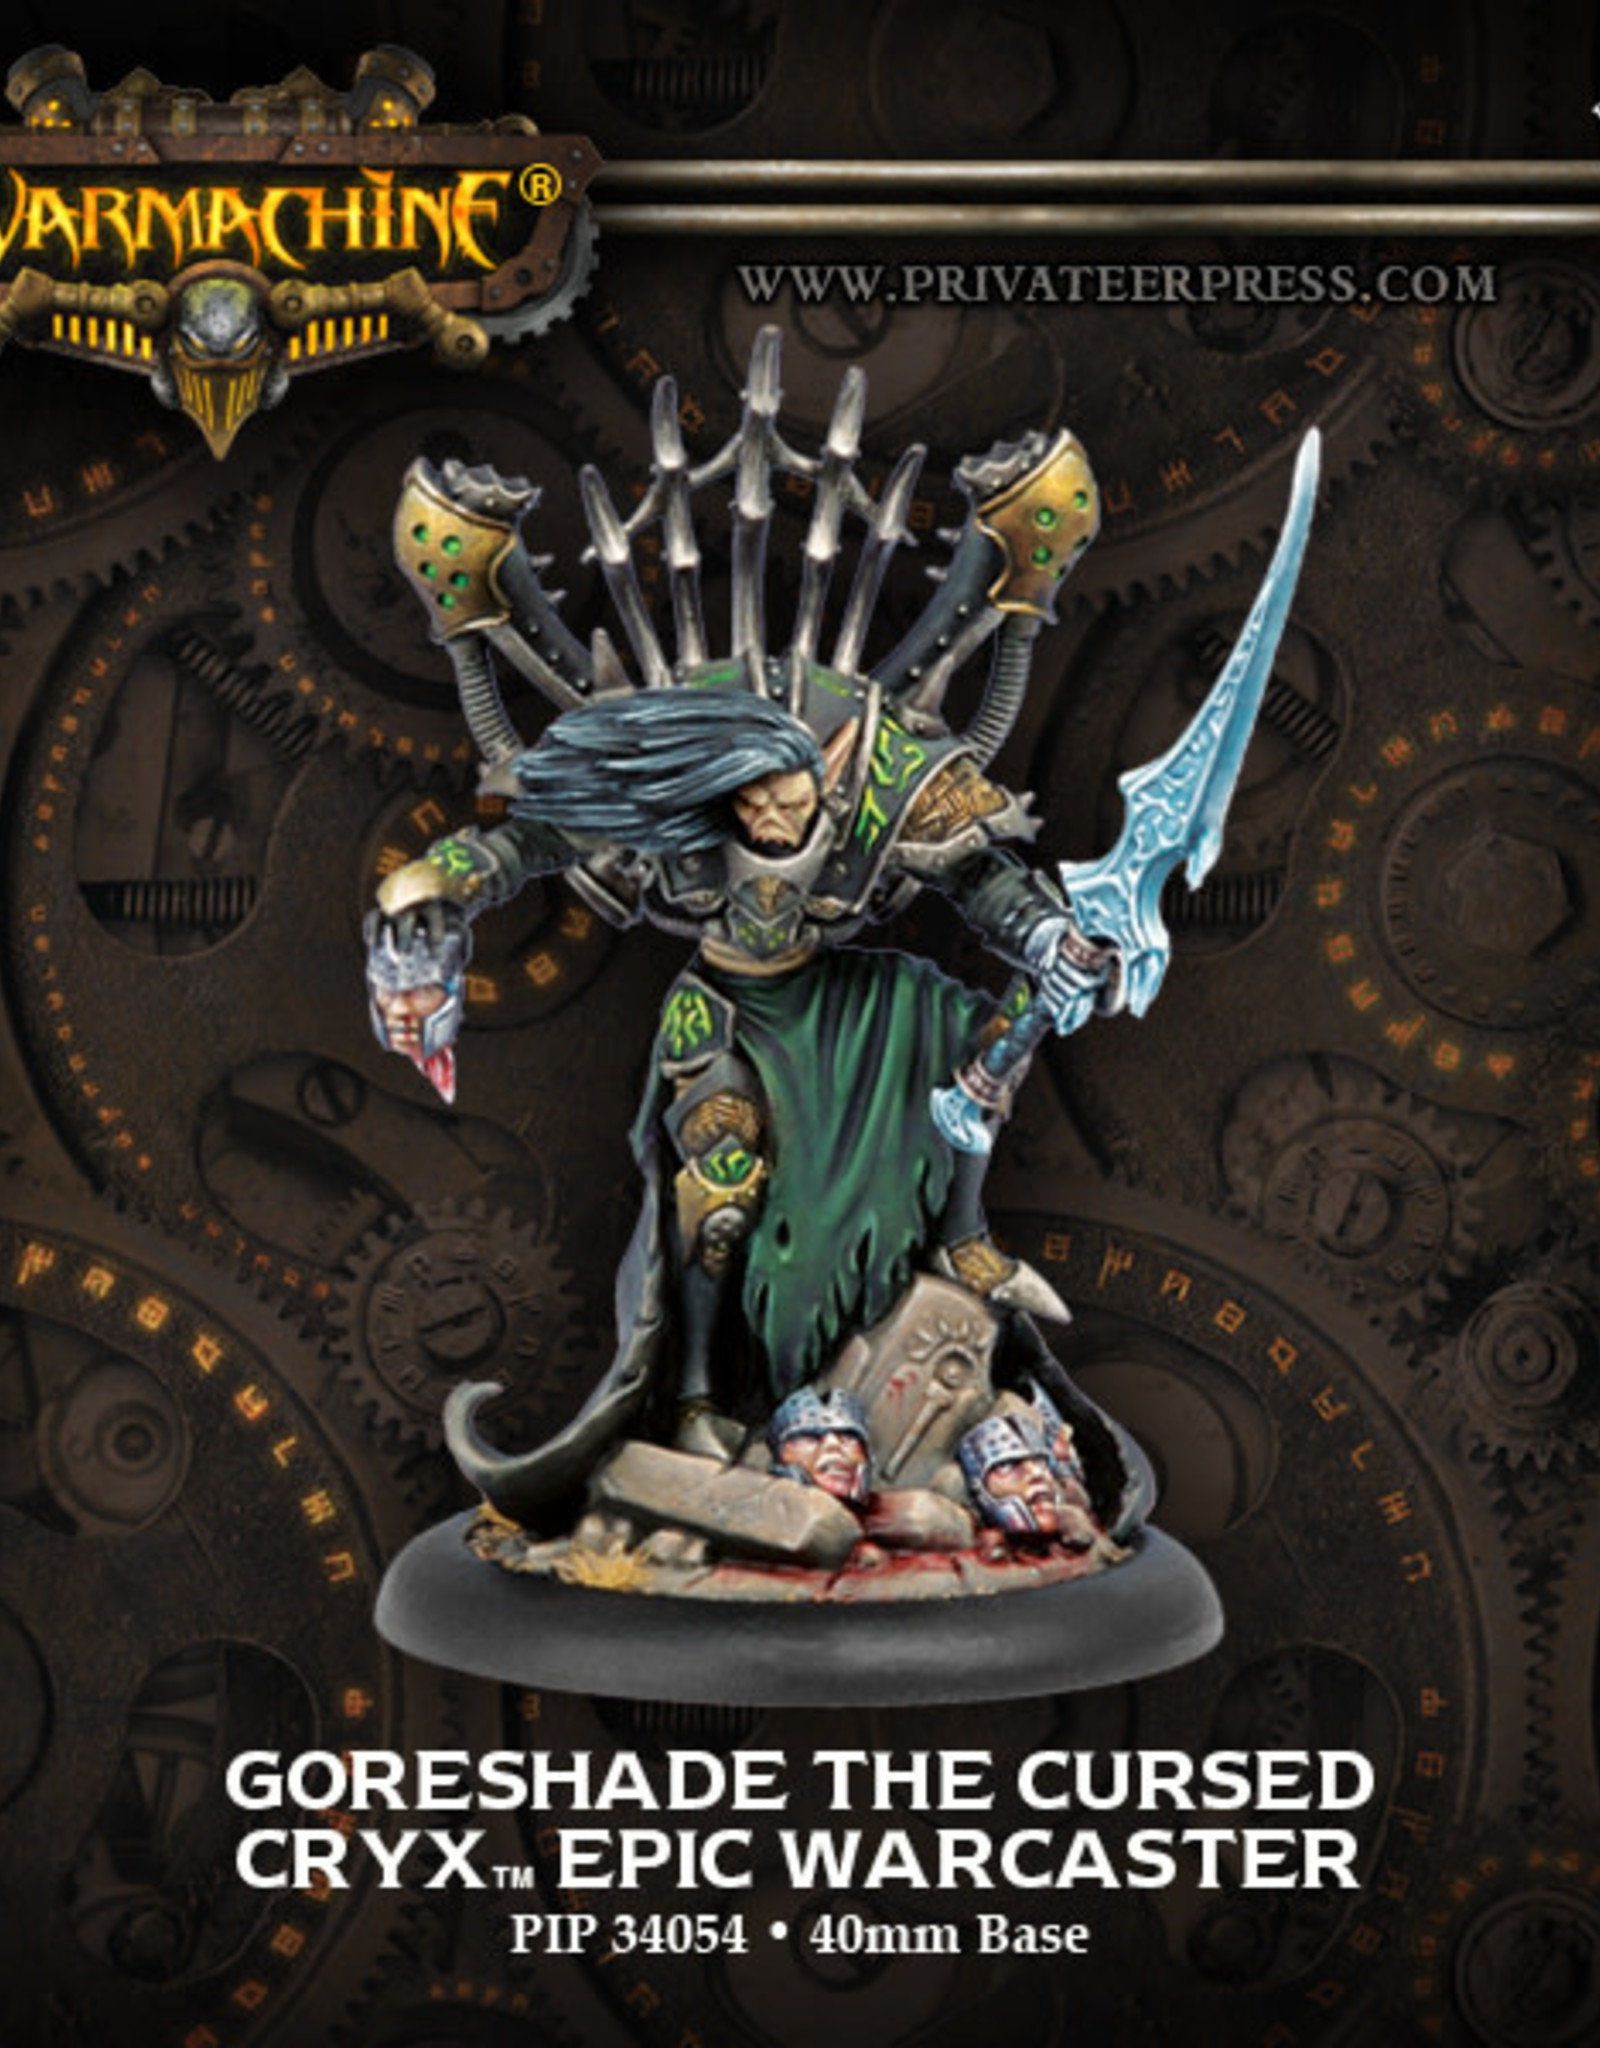 Warmachine Cryx - Goreshade the Cursed